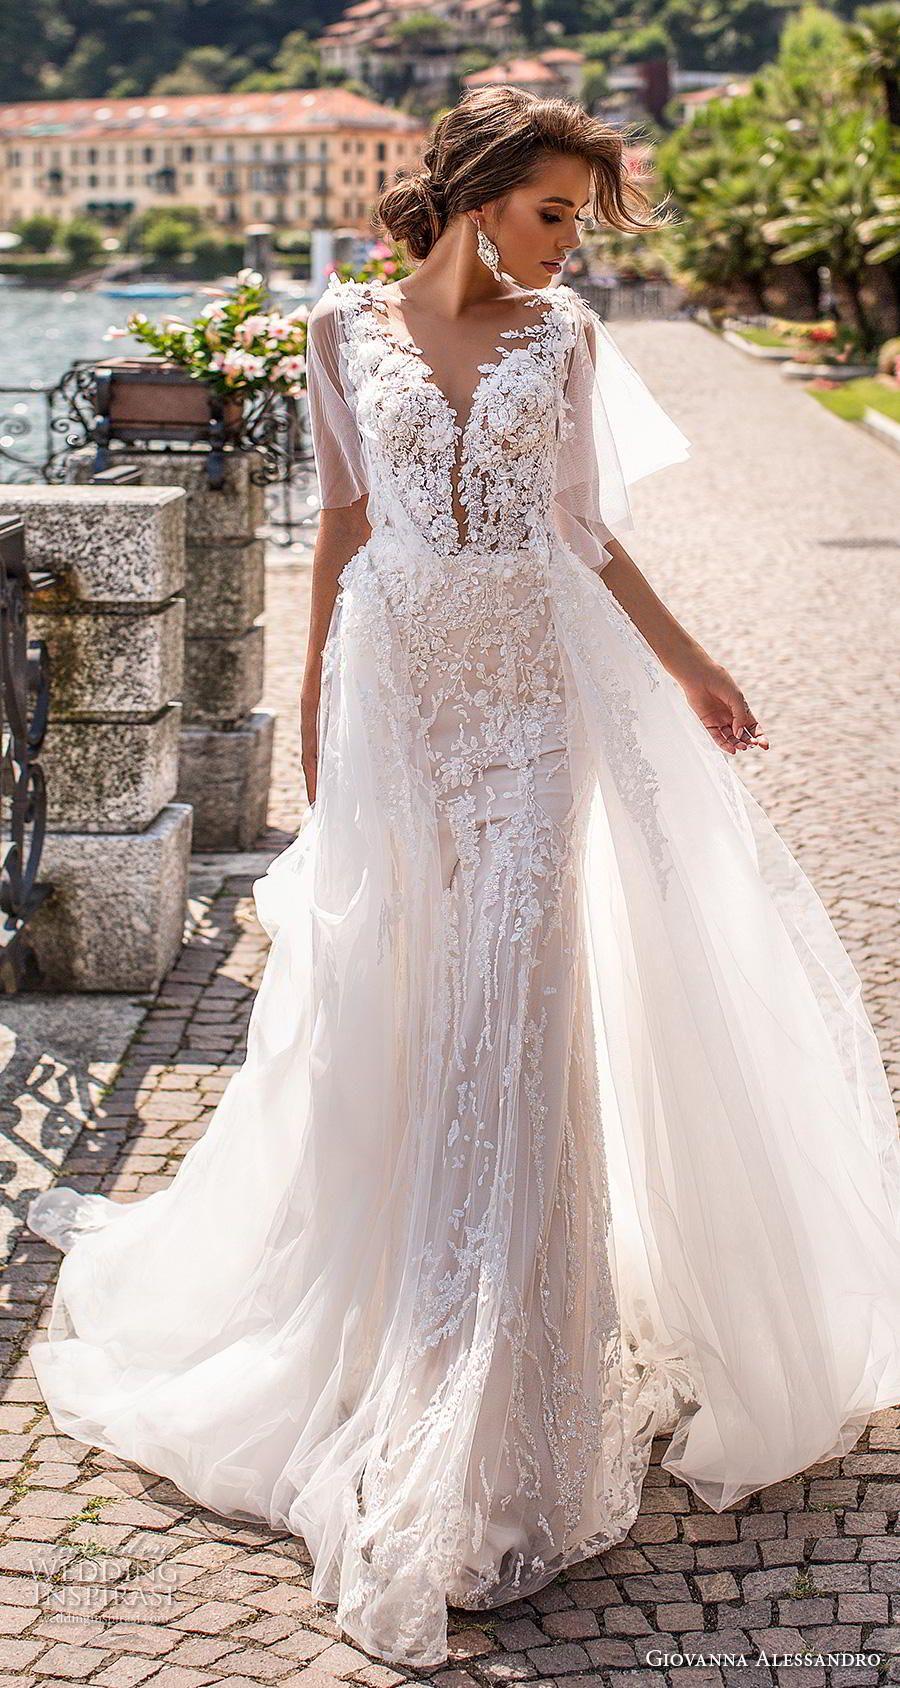 Giovanna Alessandro 2019 Wedding Dresses Magica Milano Bridal